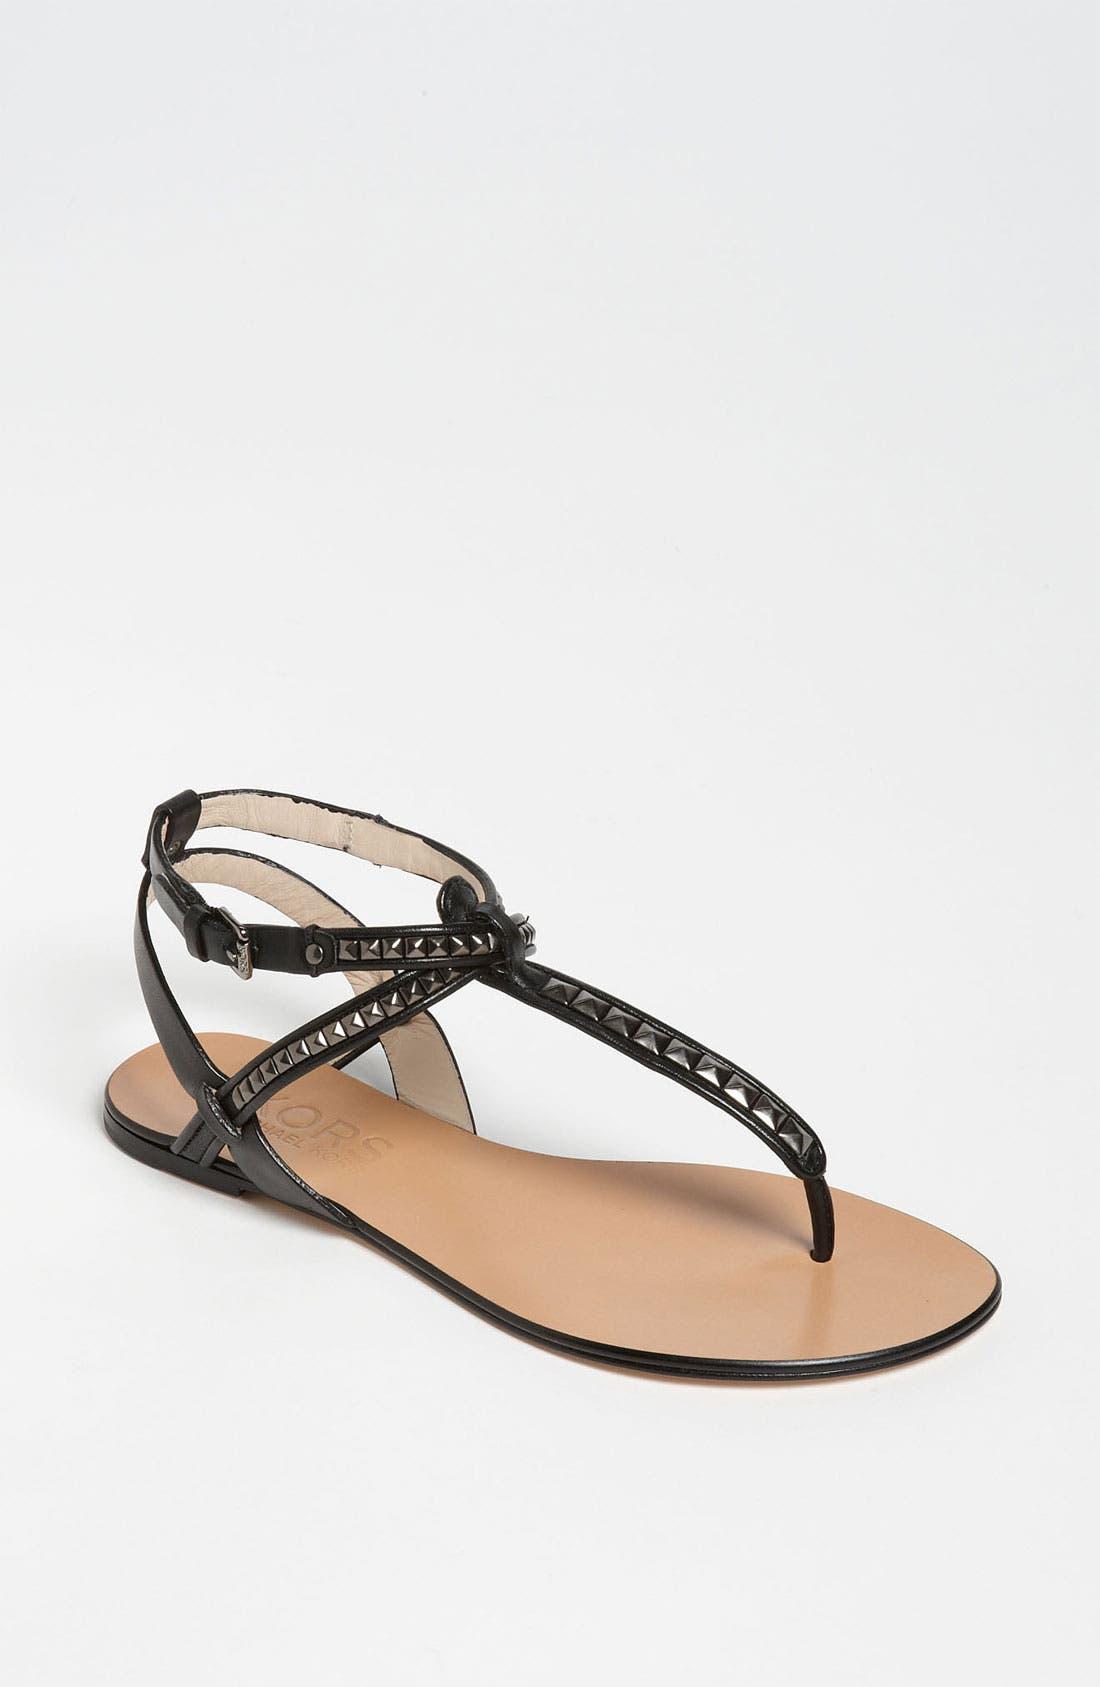 Main Image - KORS Michael Kors 'Jaina' Sandal